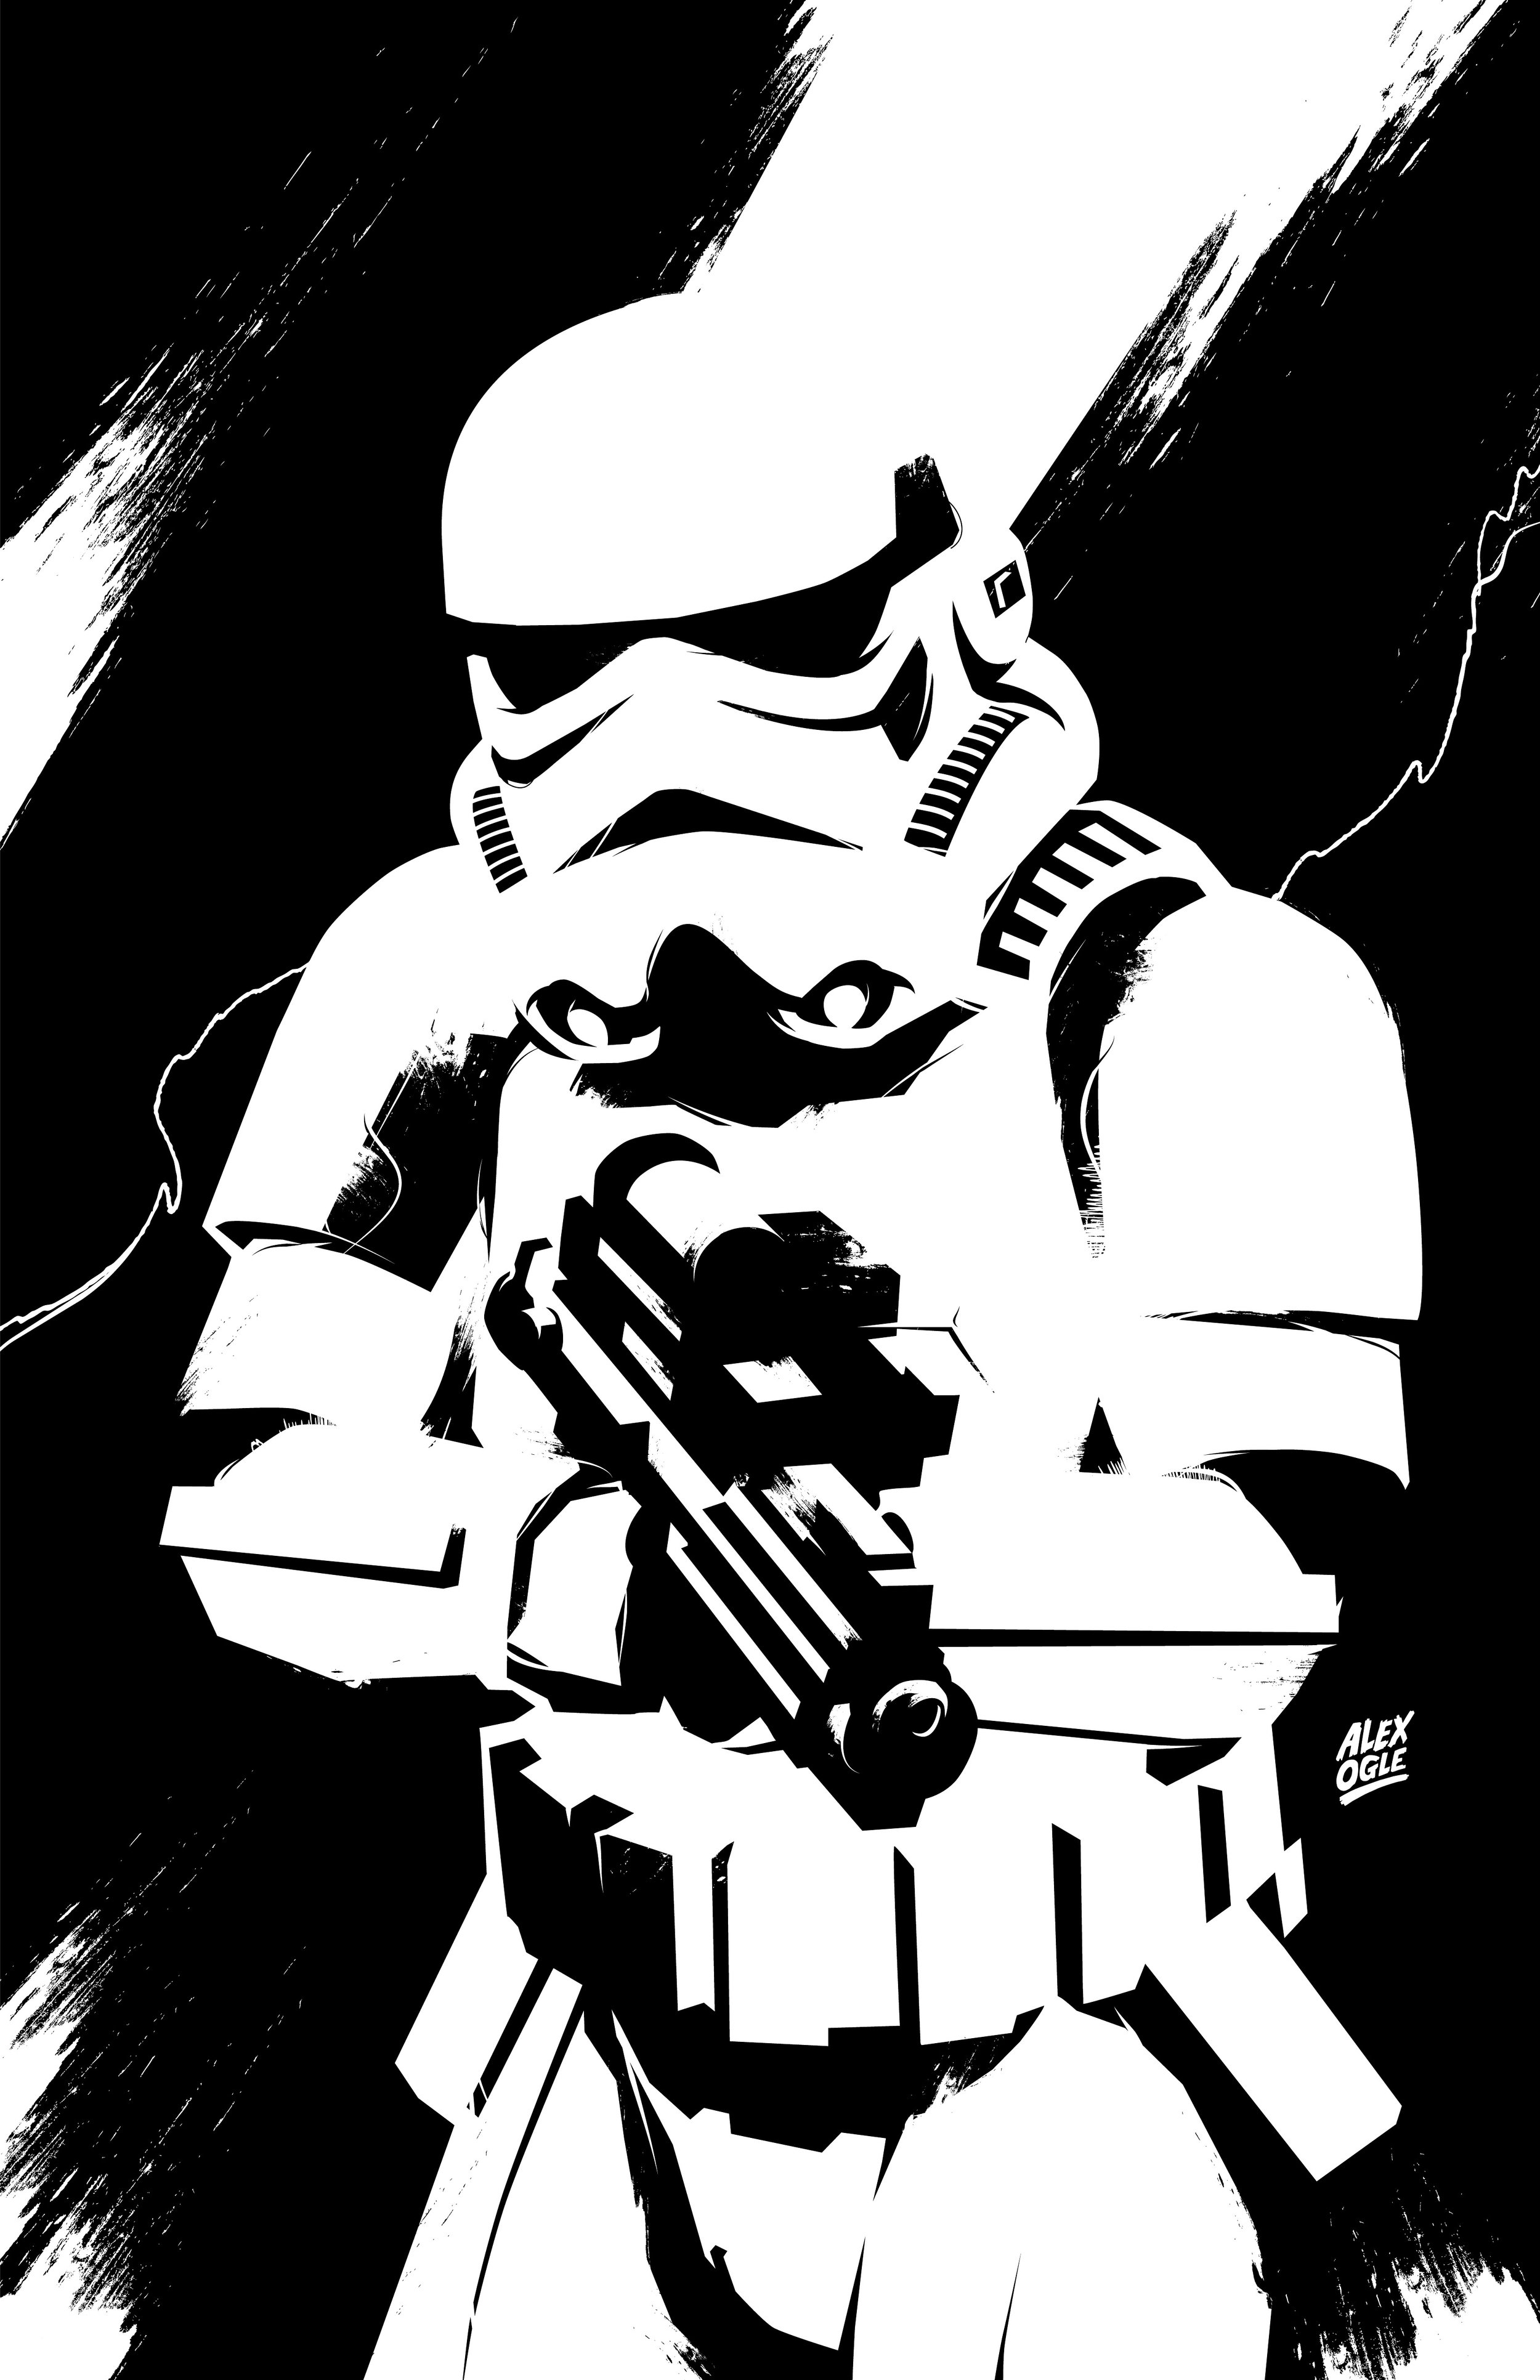 stormtrooper_11x17.jpg